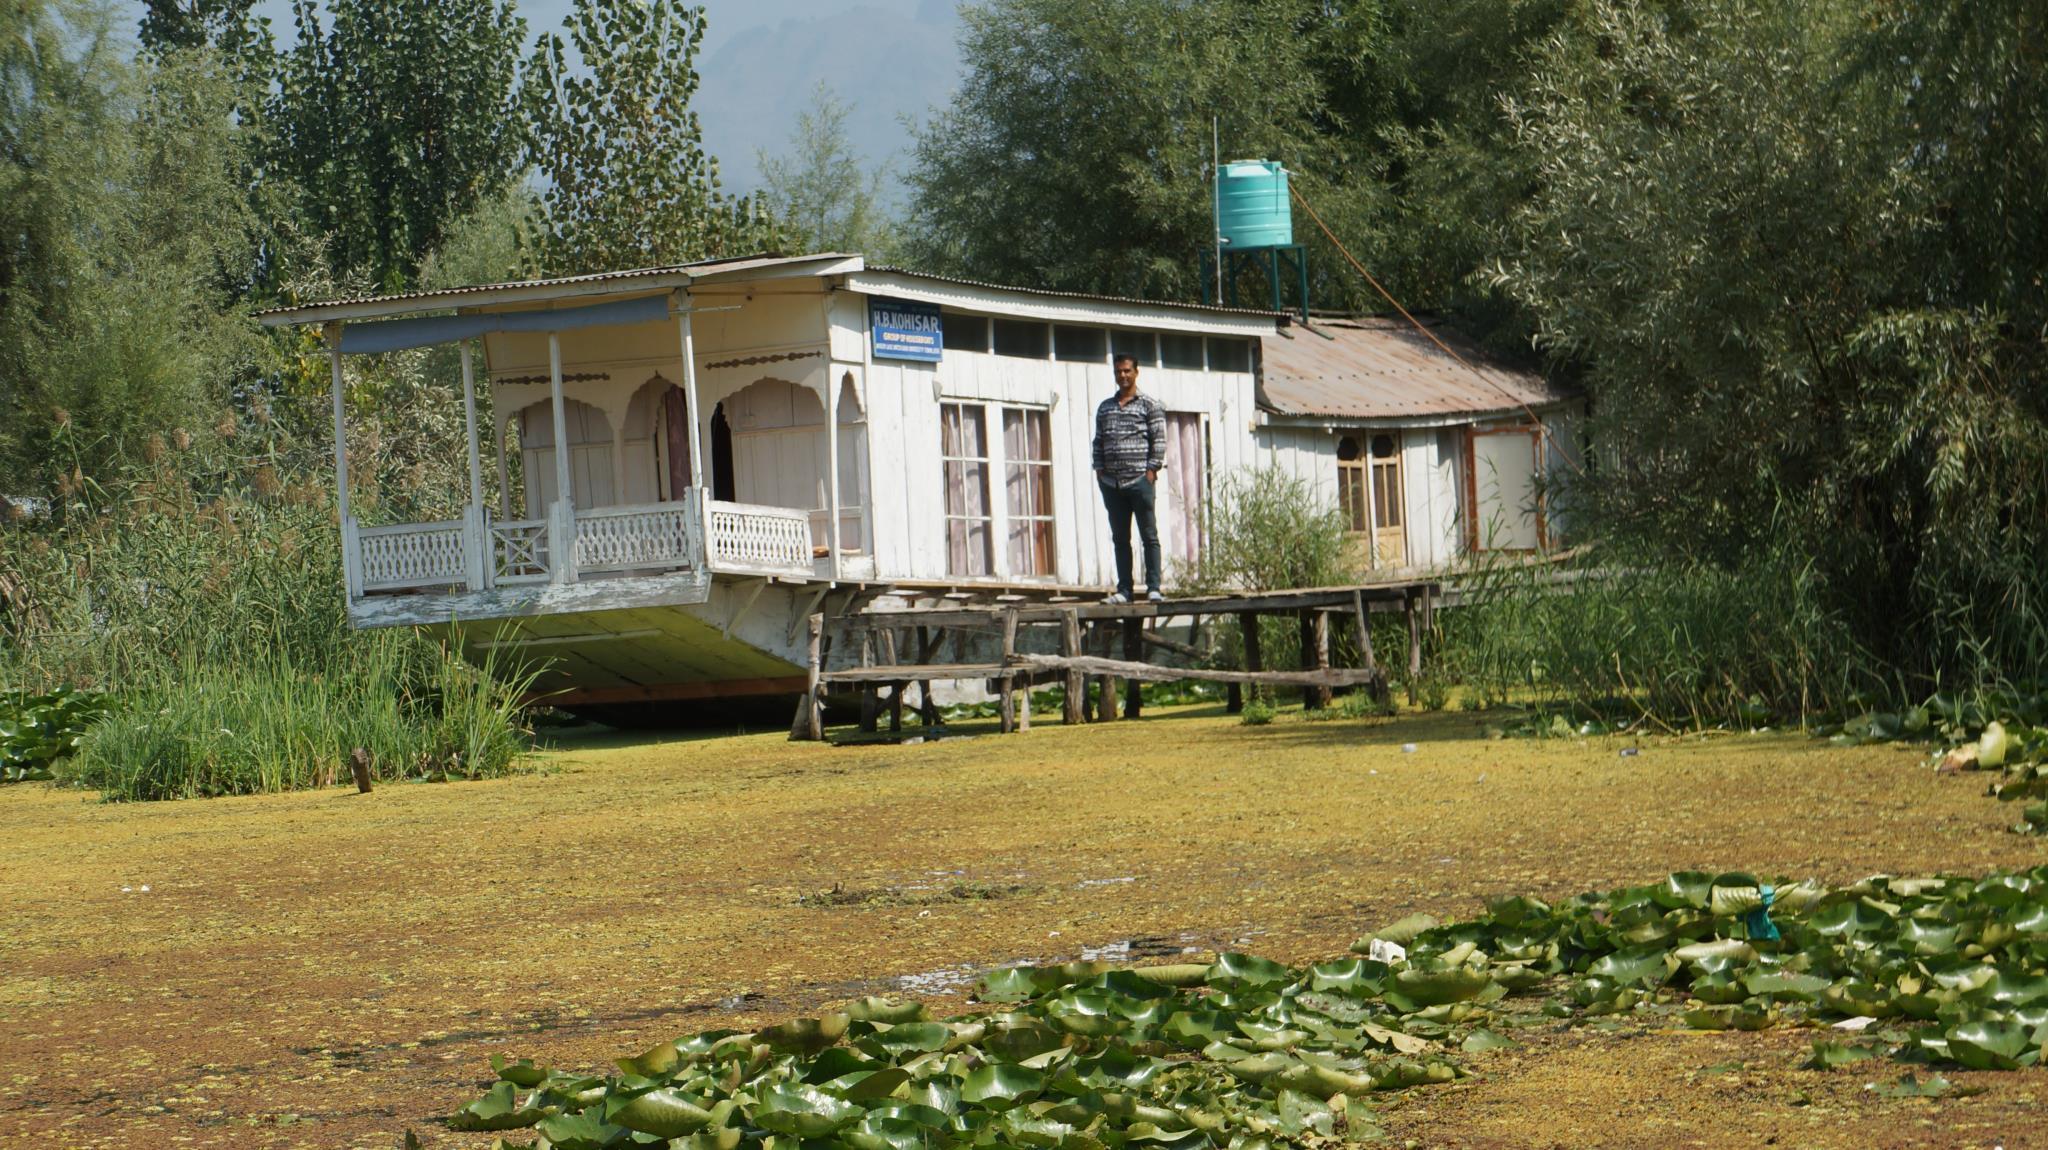 Young Kohisar Houseboat